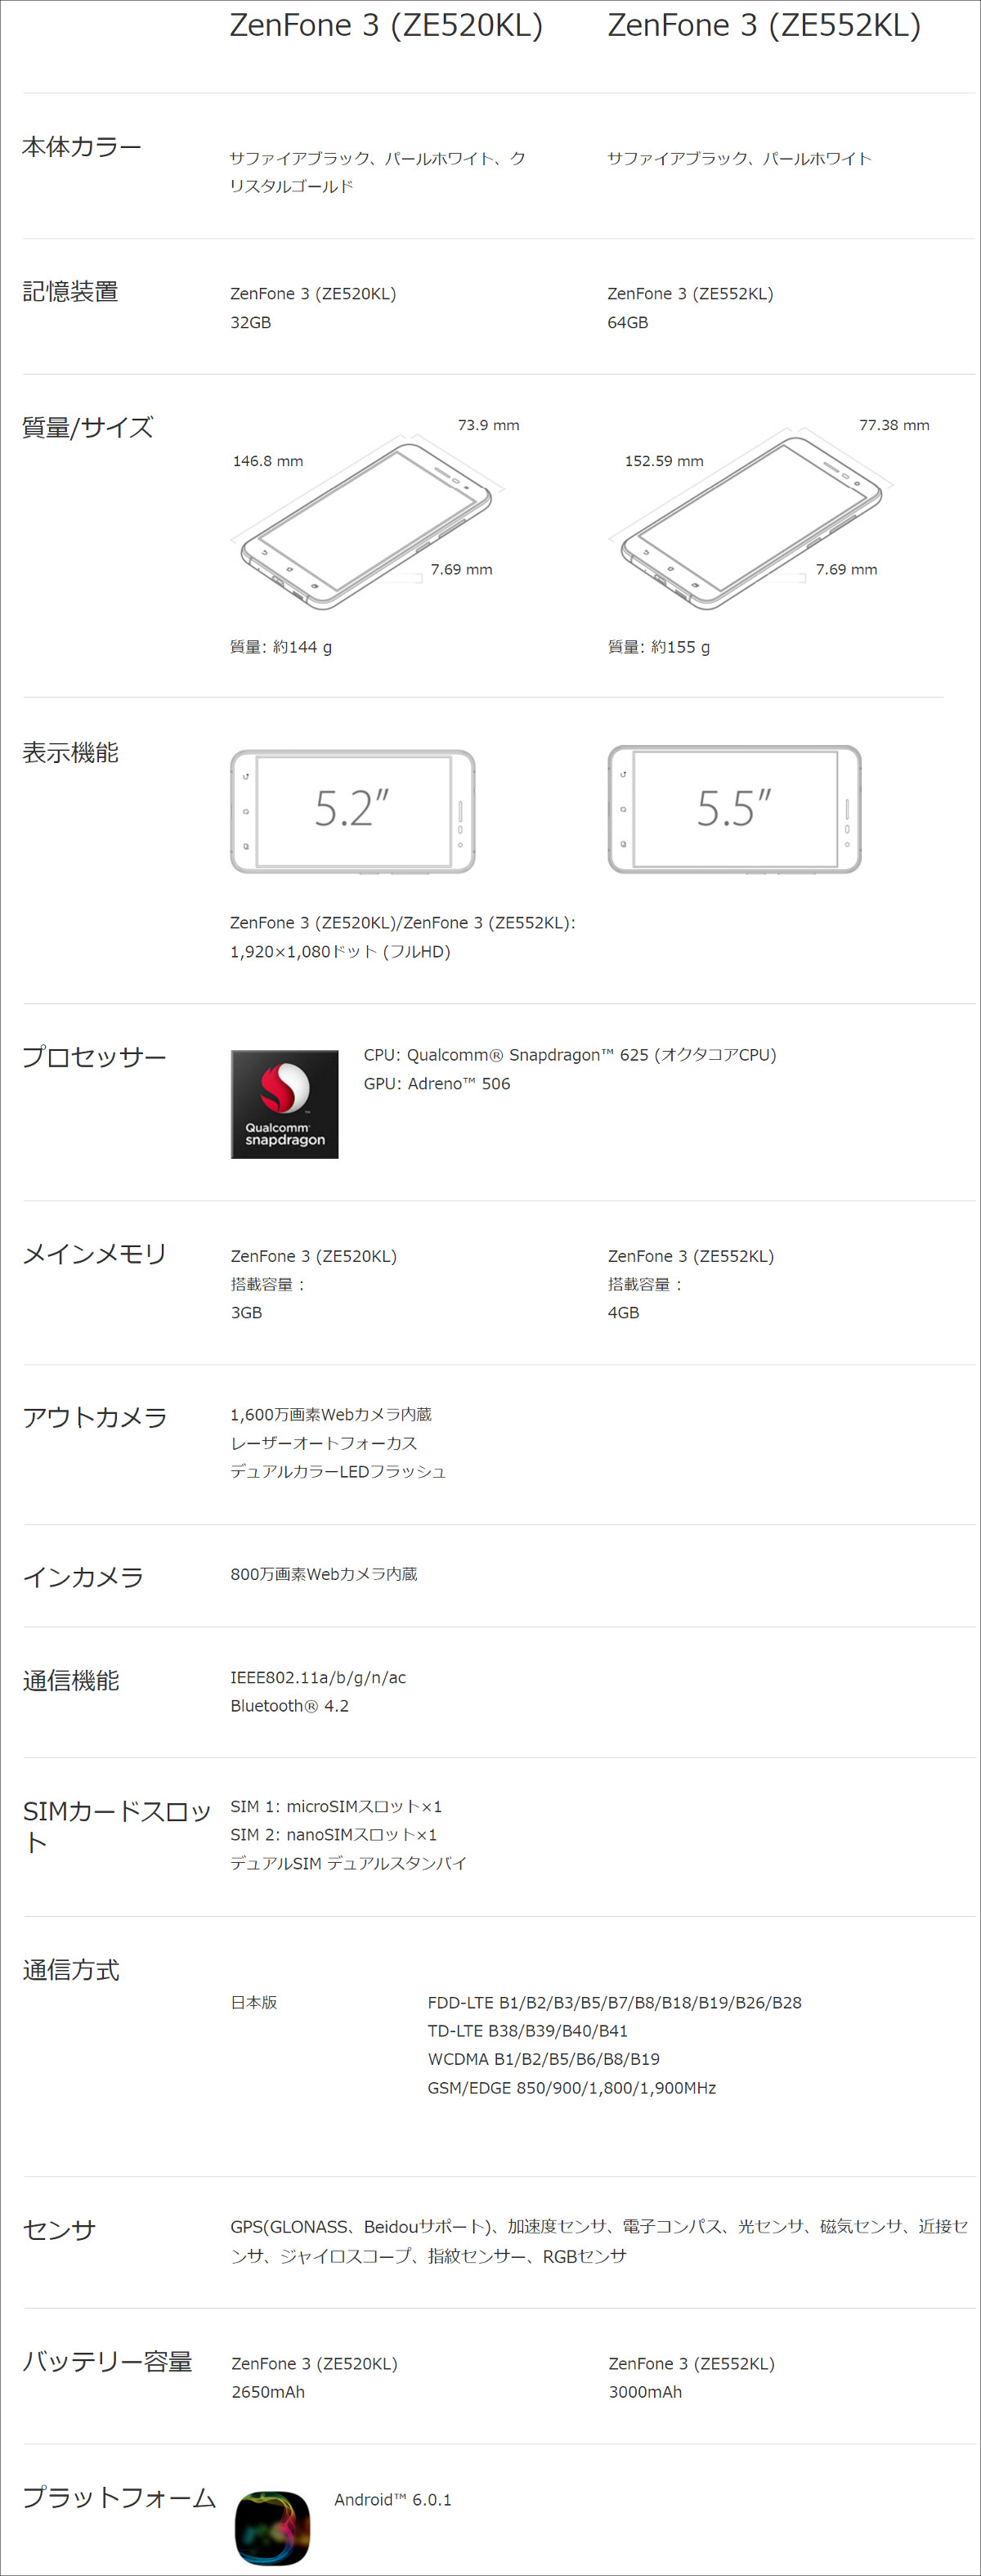 ASUS ZenFone 3 (ZE552KL) スペック表